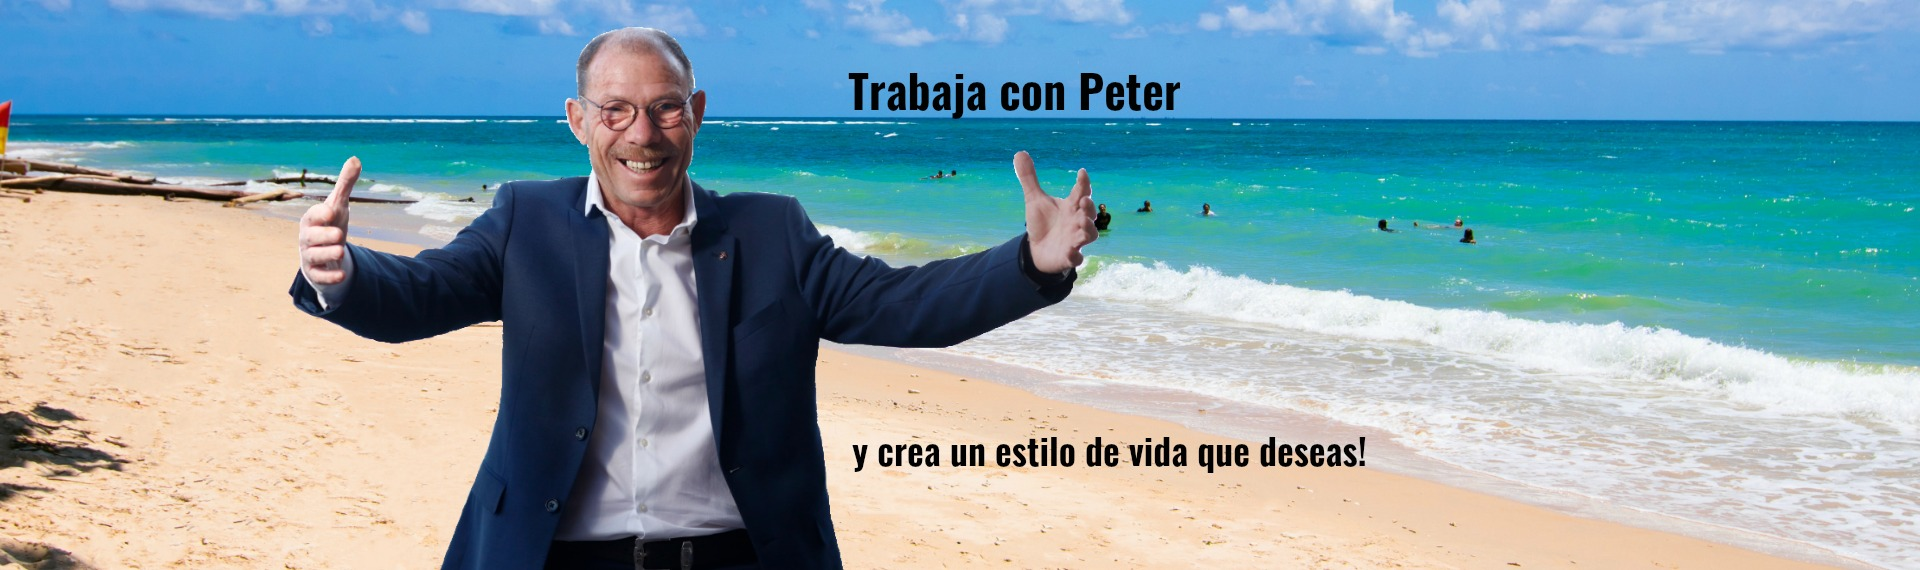 Banner Trabaja con Peter